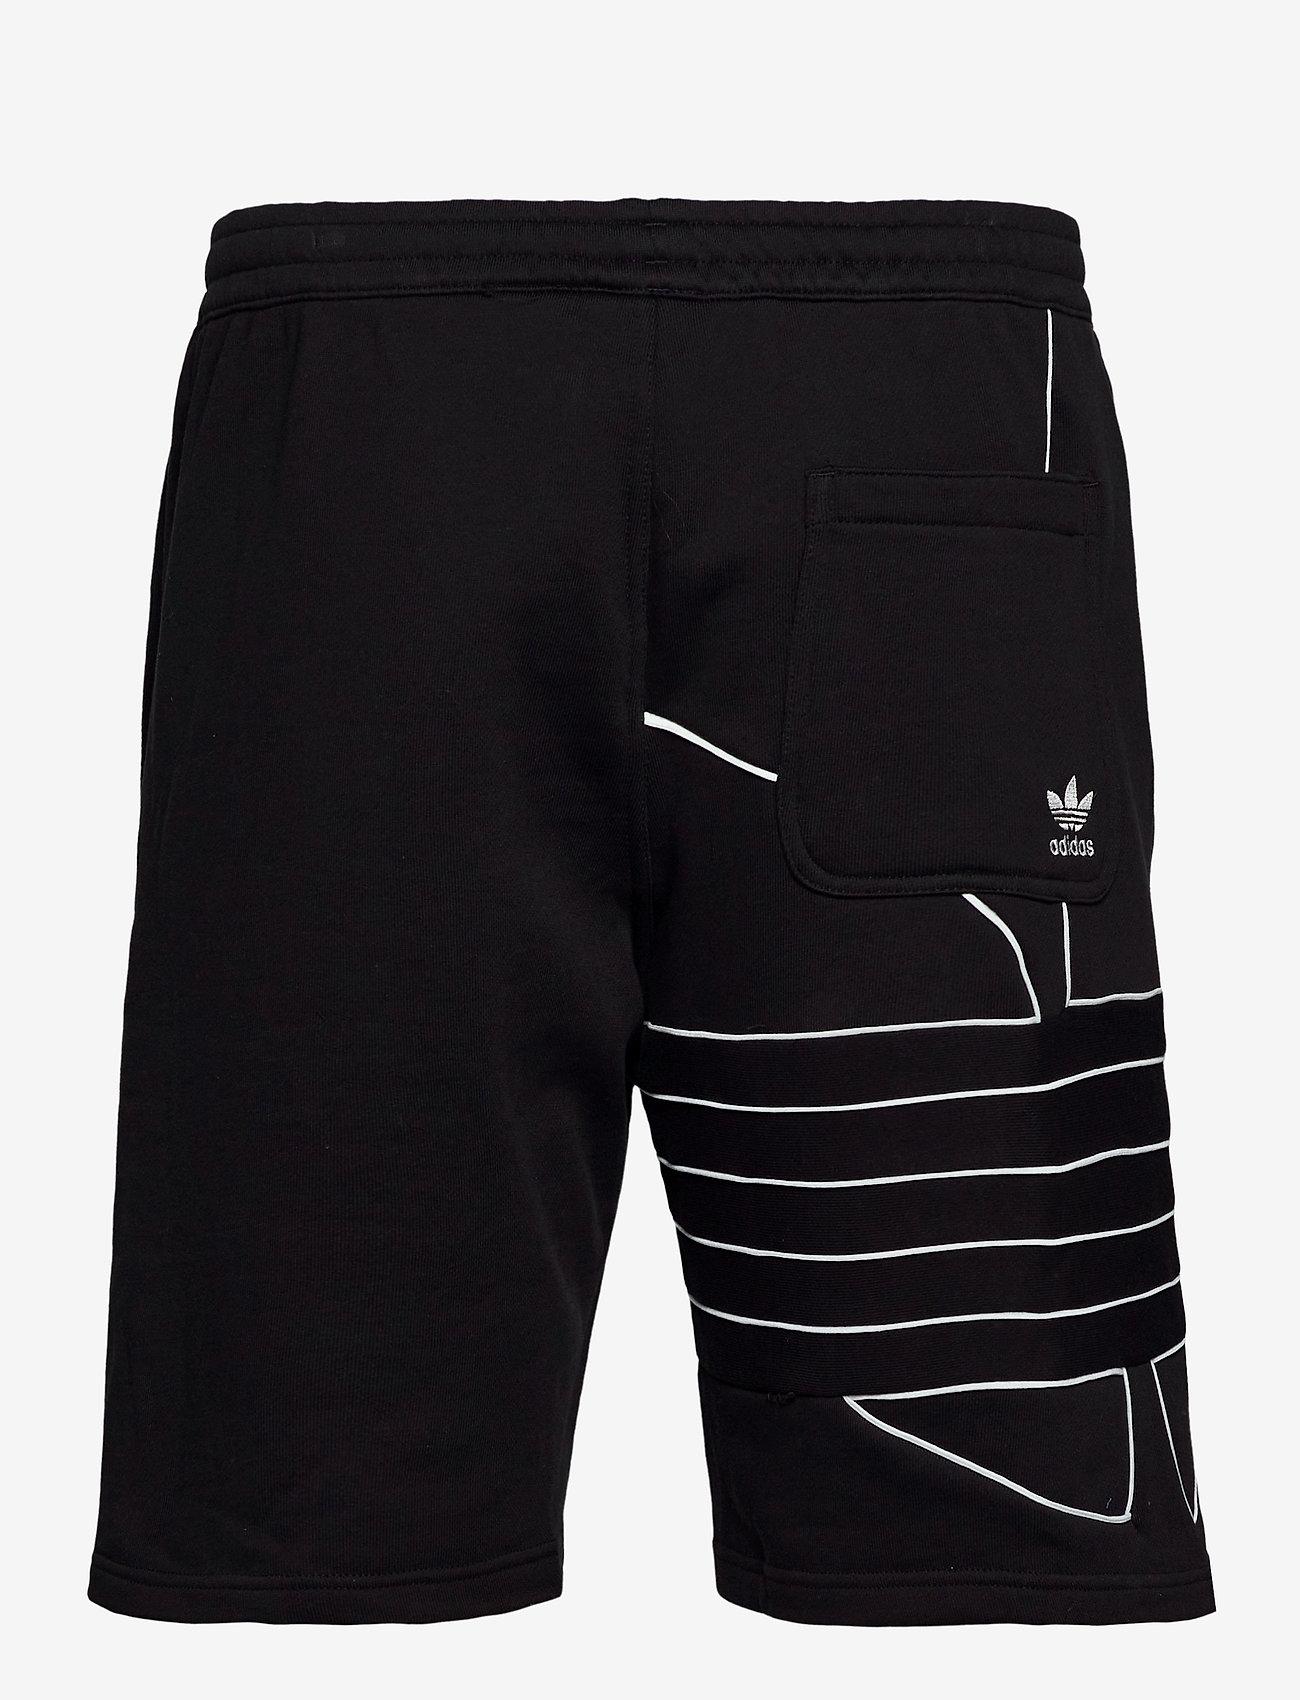 adidas Originals BG T OUT SHORT - Shorts BLACK/WHITE - Menn Klær